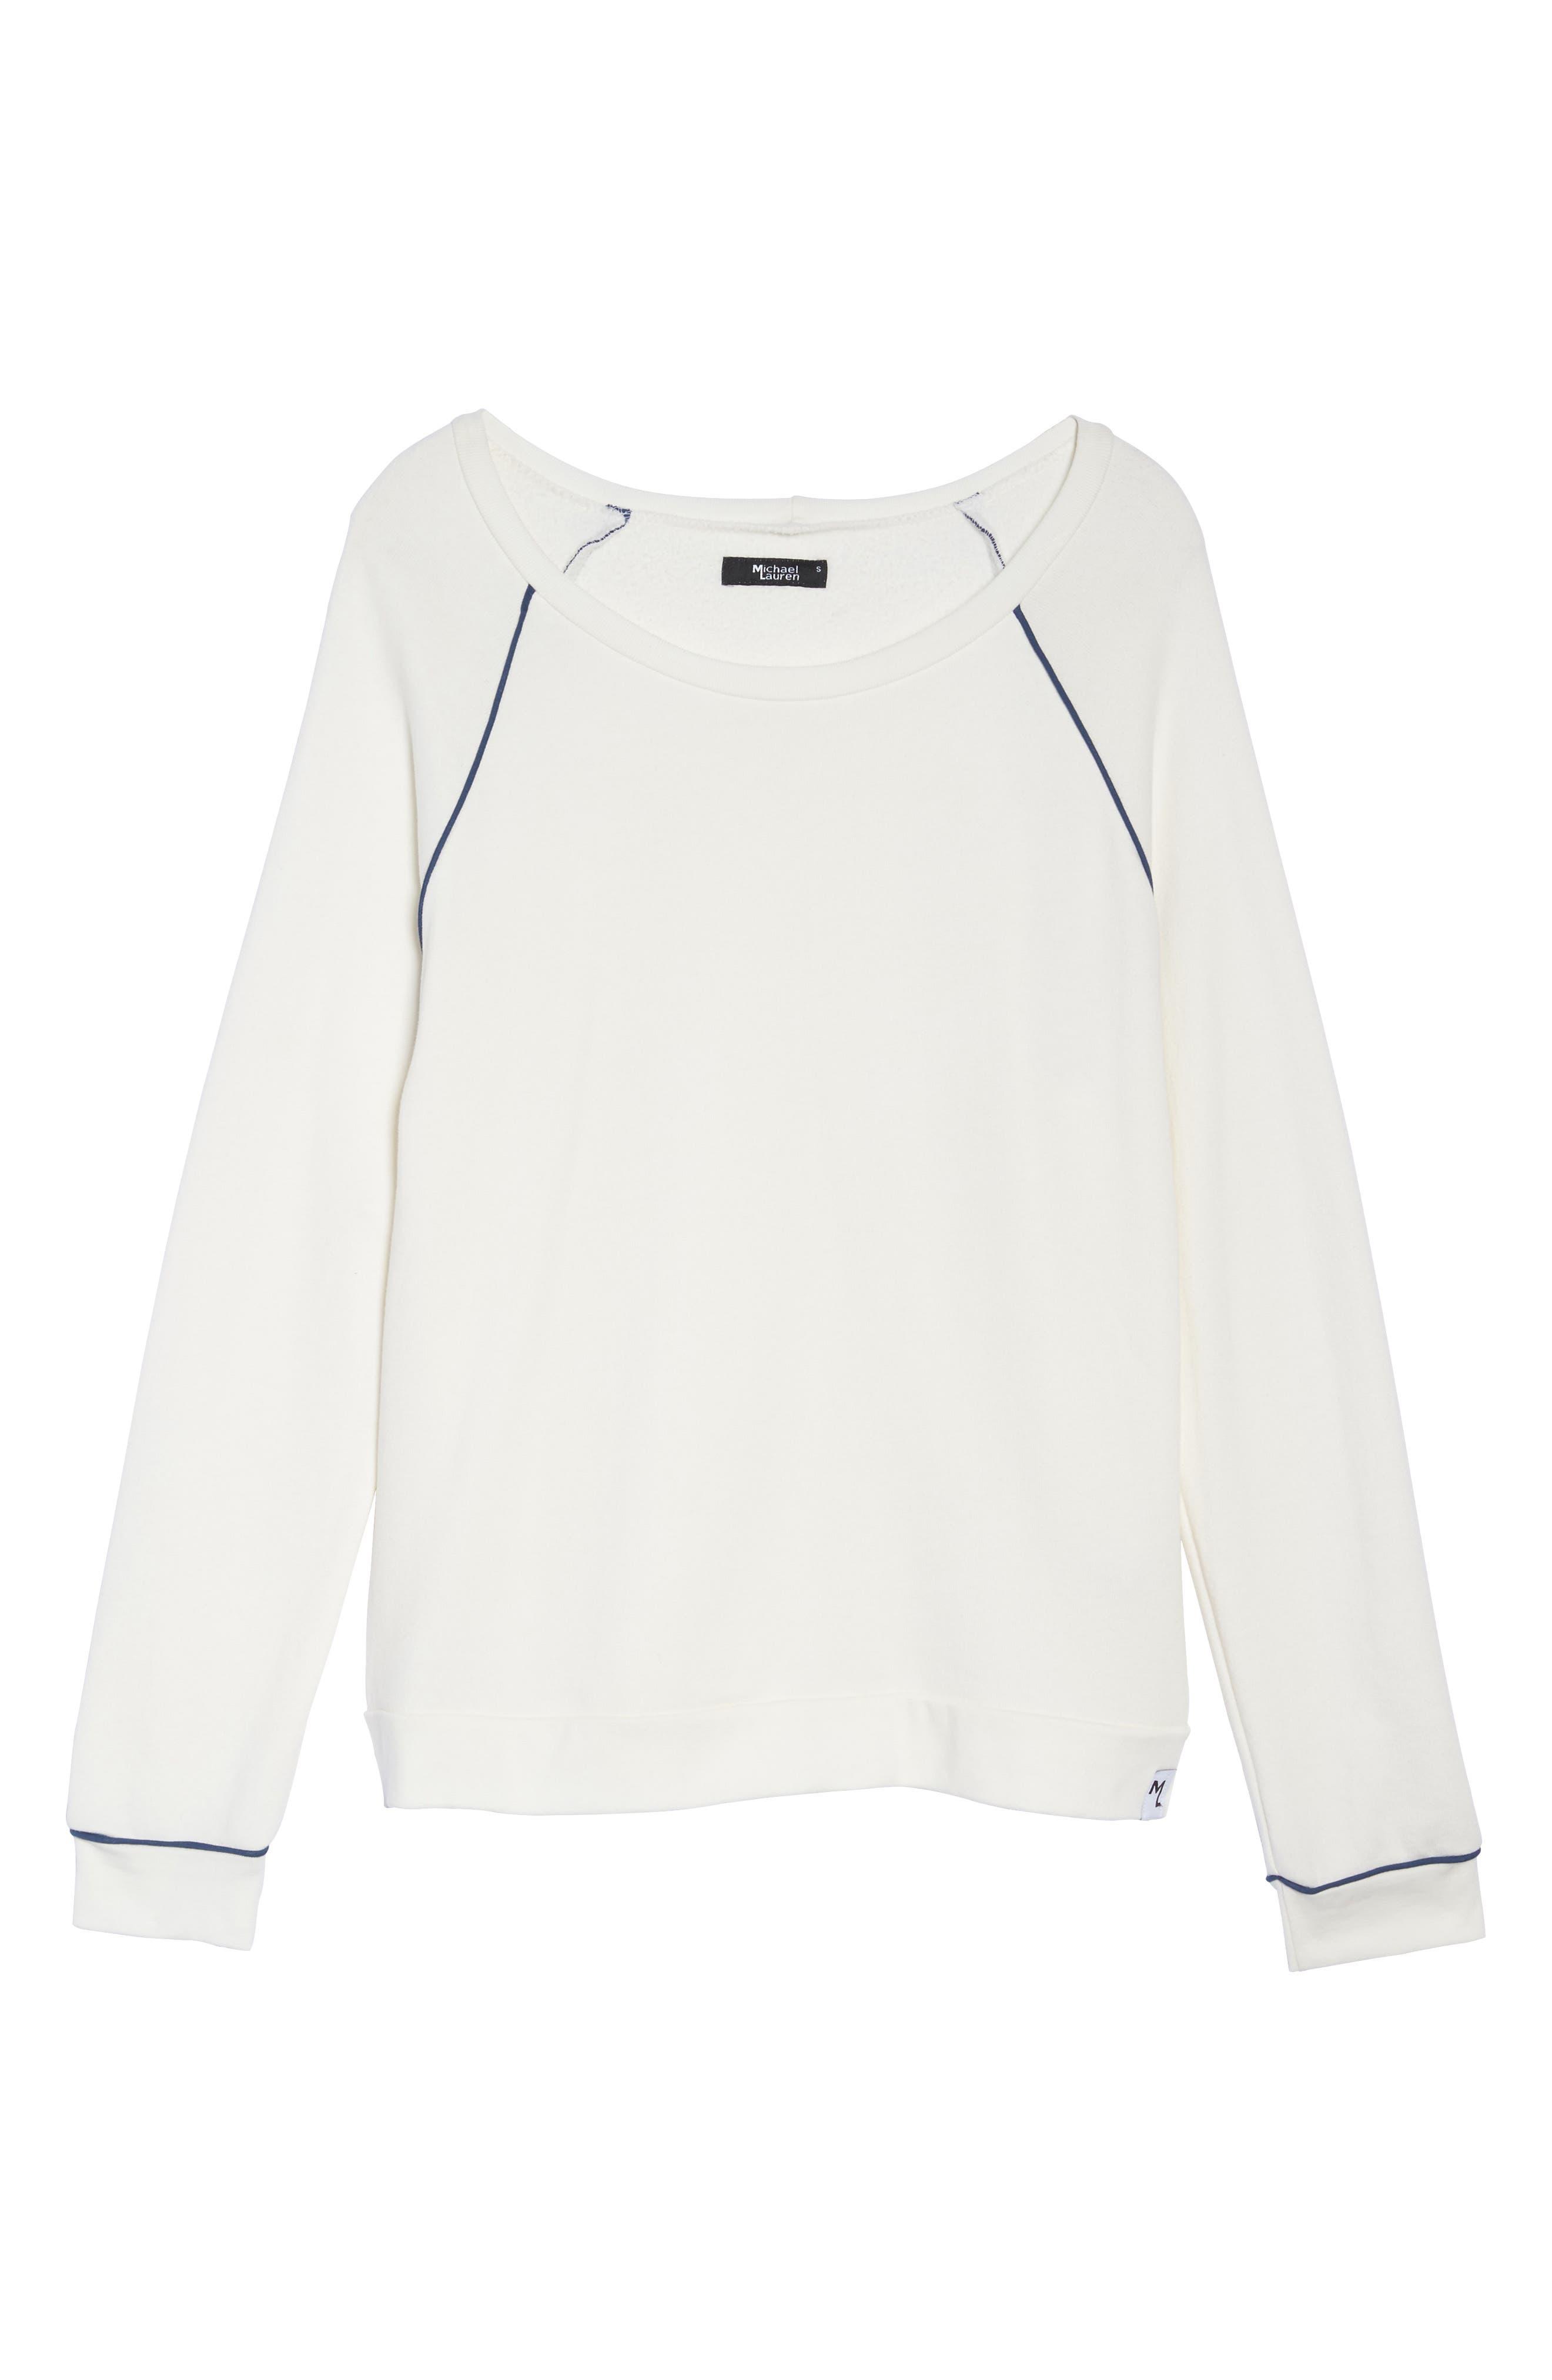 Juniper Lounge Sweatshirt,                             Alternate thumbnail 4, color,                             Milk/ Ink Blue